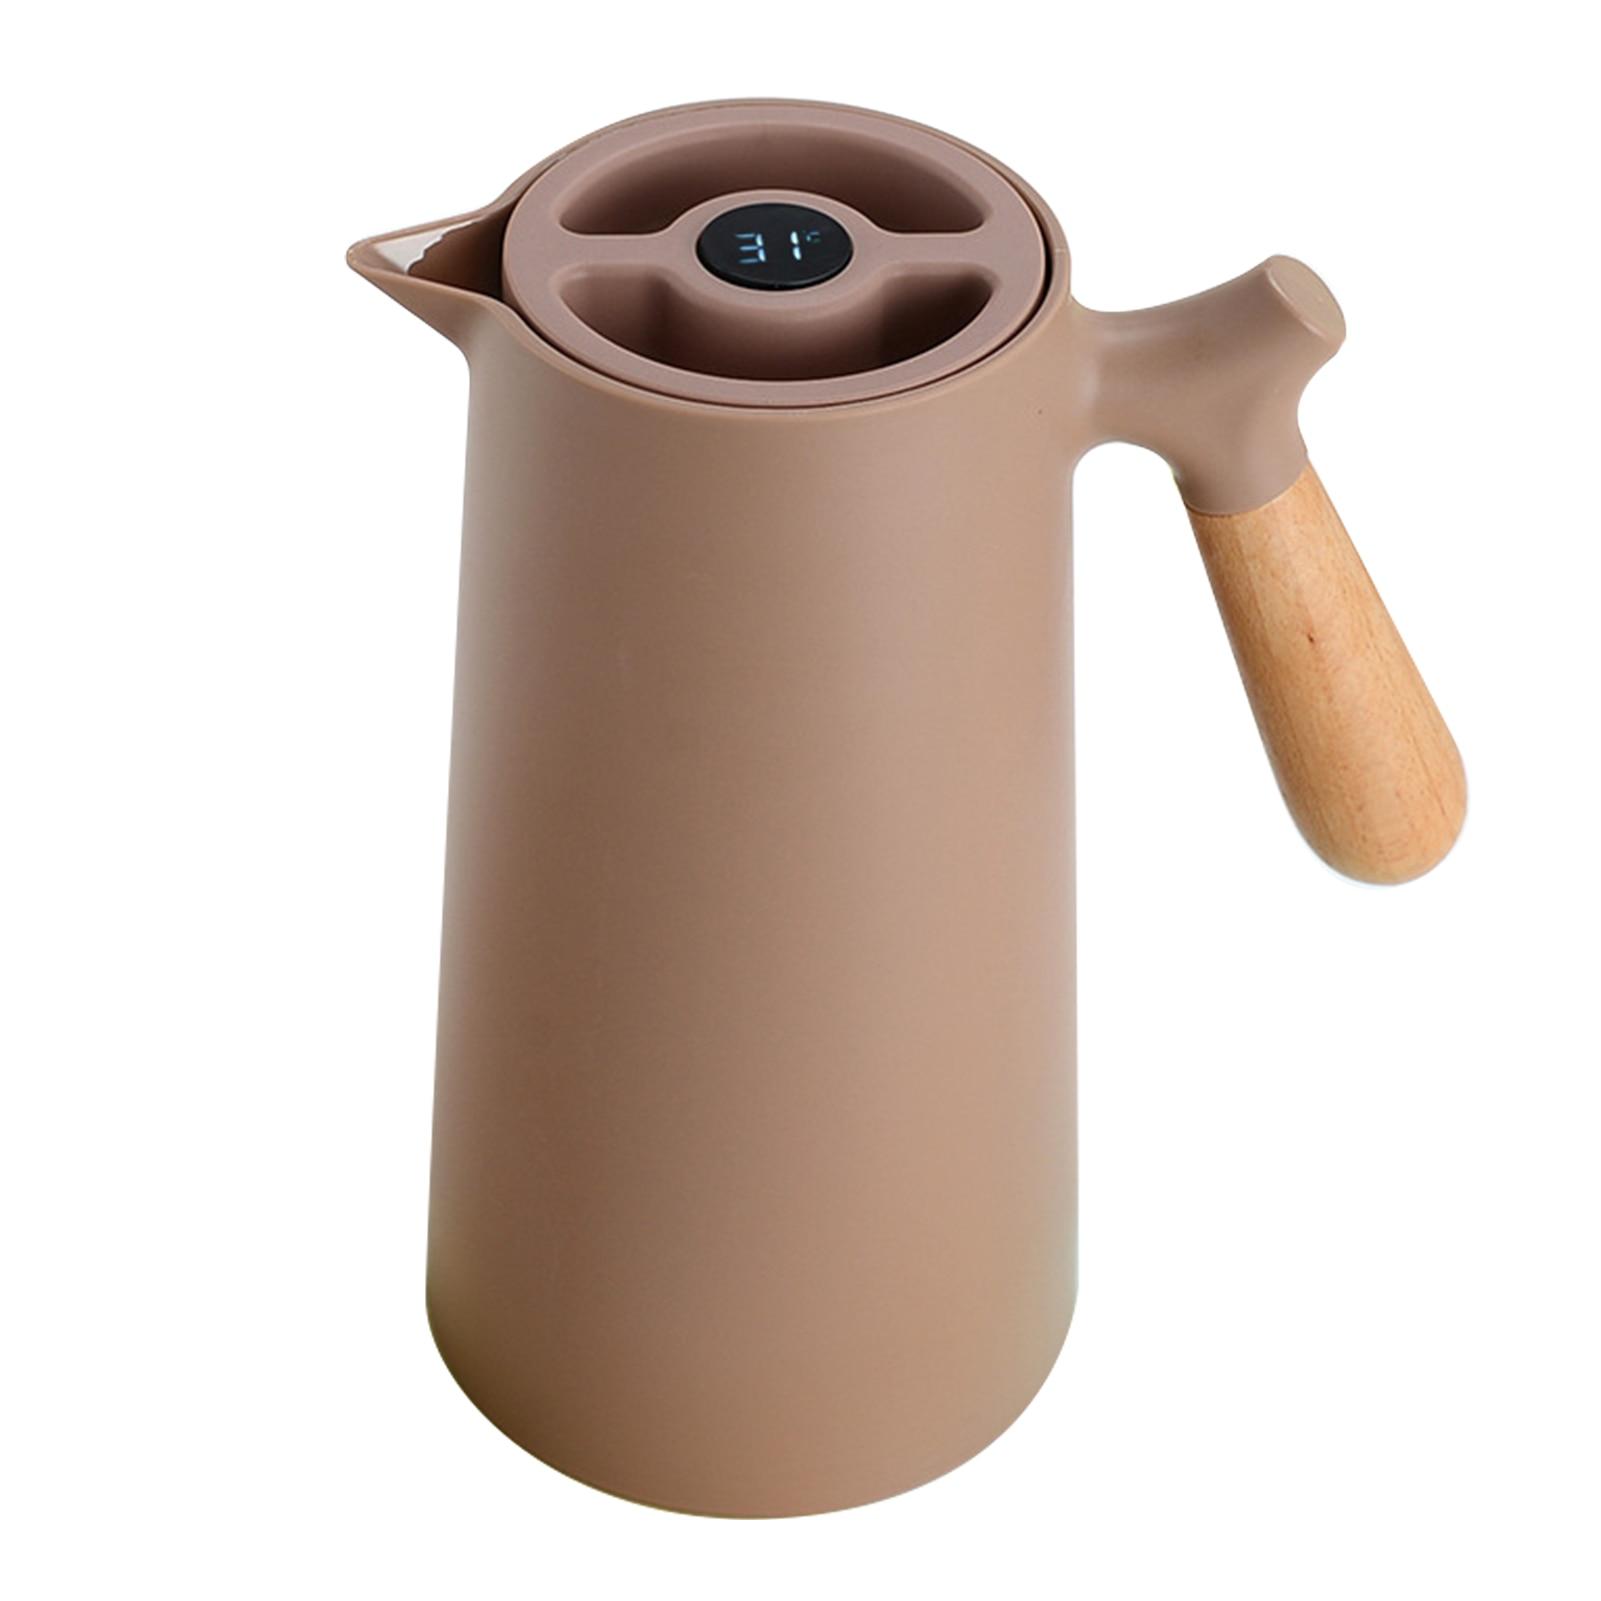 1L اضغط على زر متعددة الوظائف فراغ معزول حفلة الشاي موزع القهوة الحرارية Carafe المشروبات المنزل الخشب مقبض مكافحة قطرة